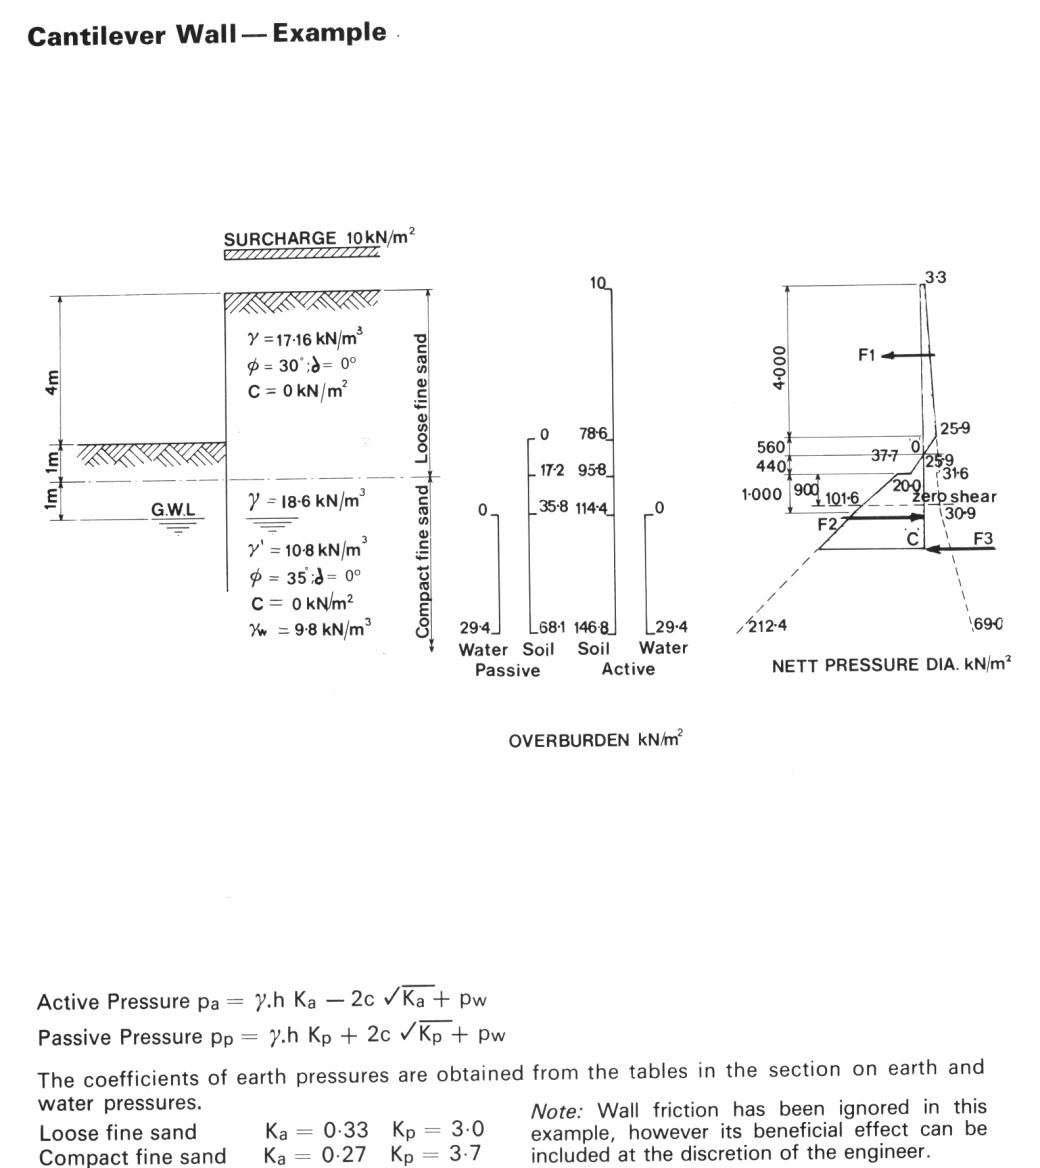 BSC Cantilever Problem